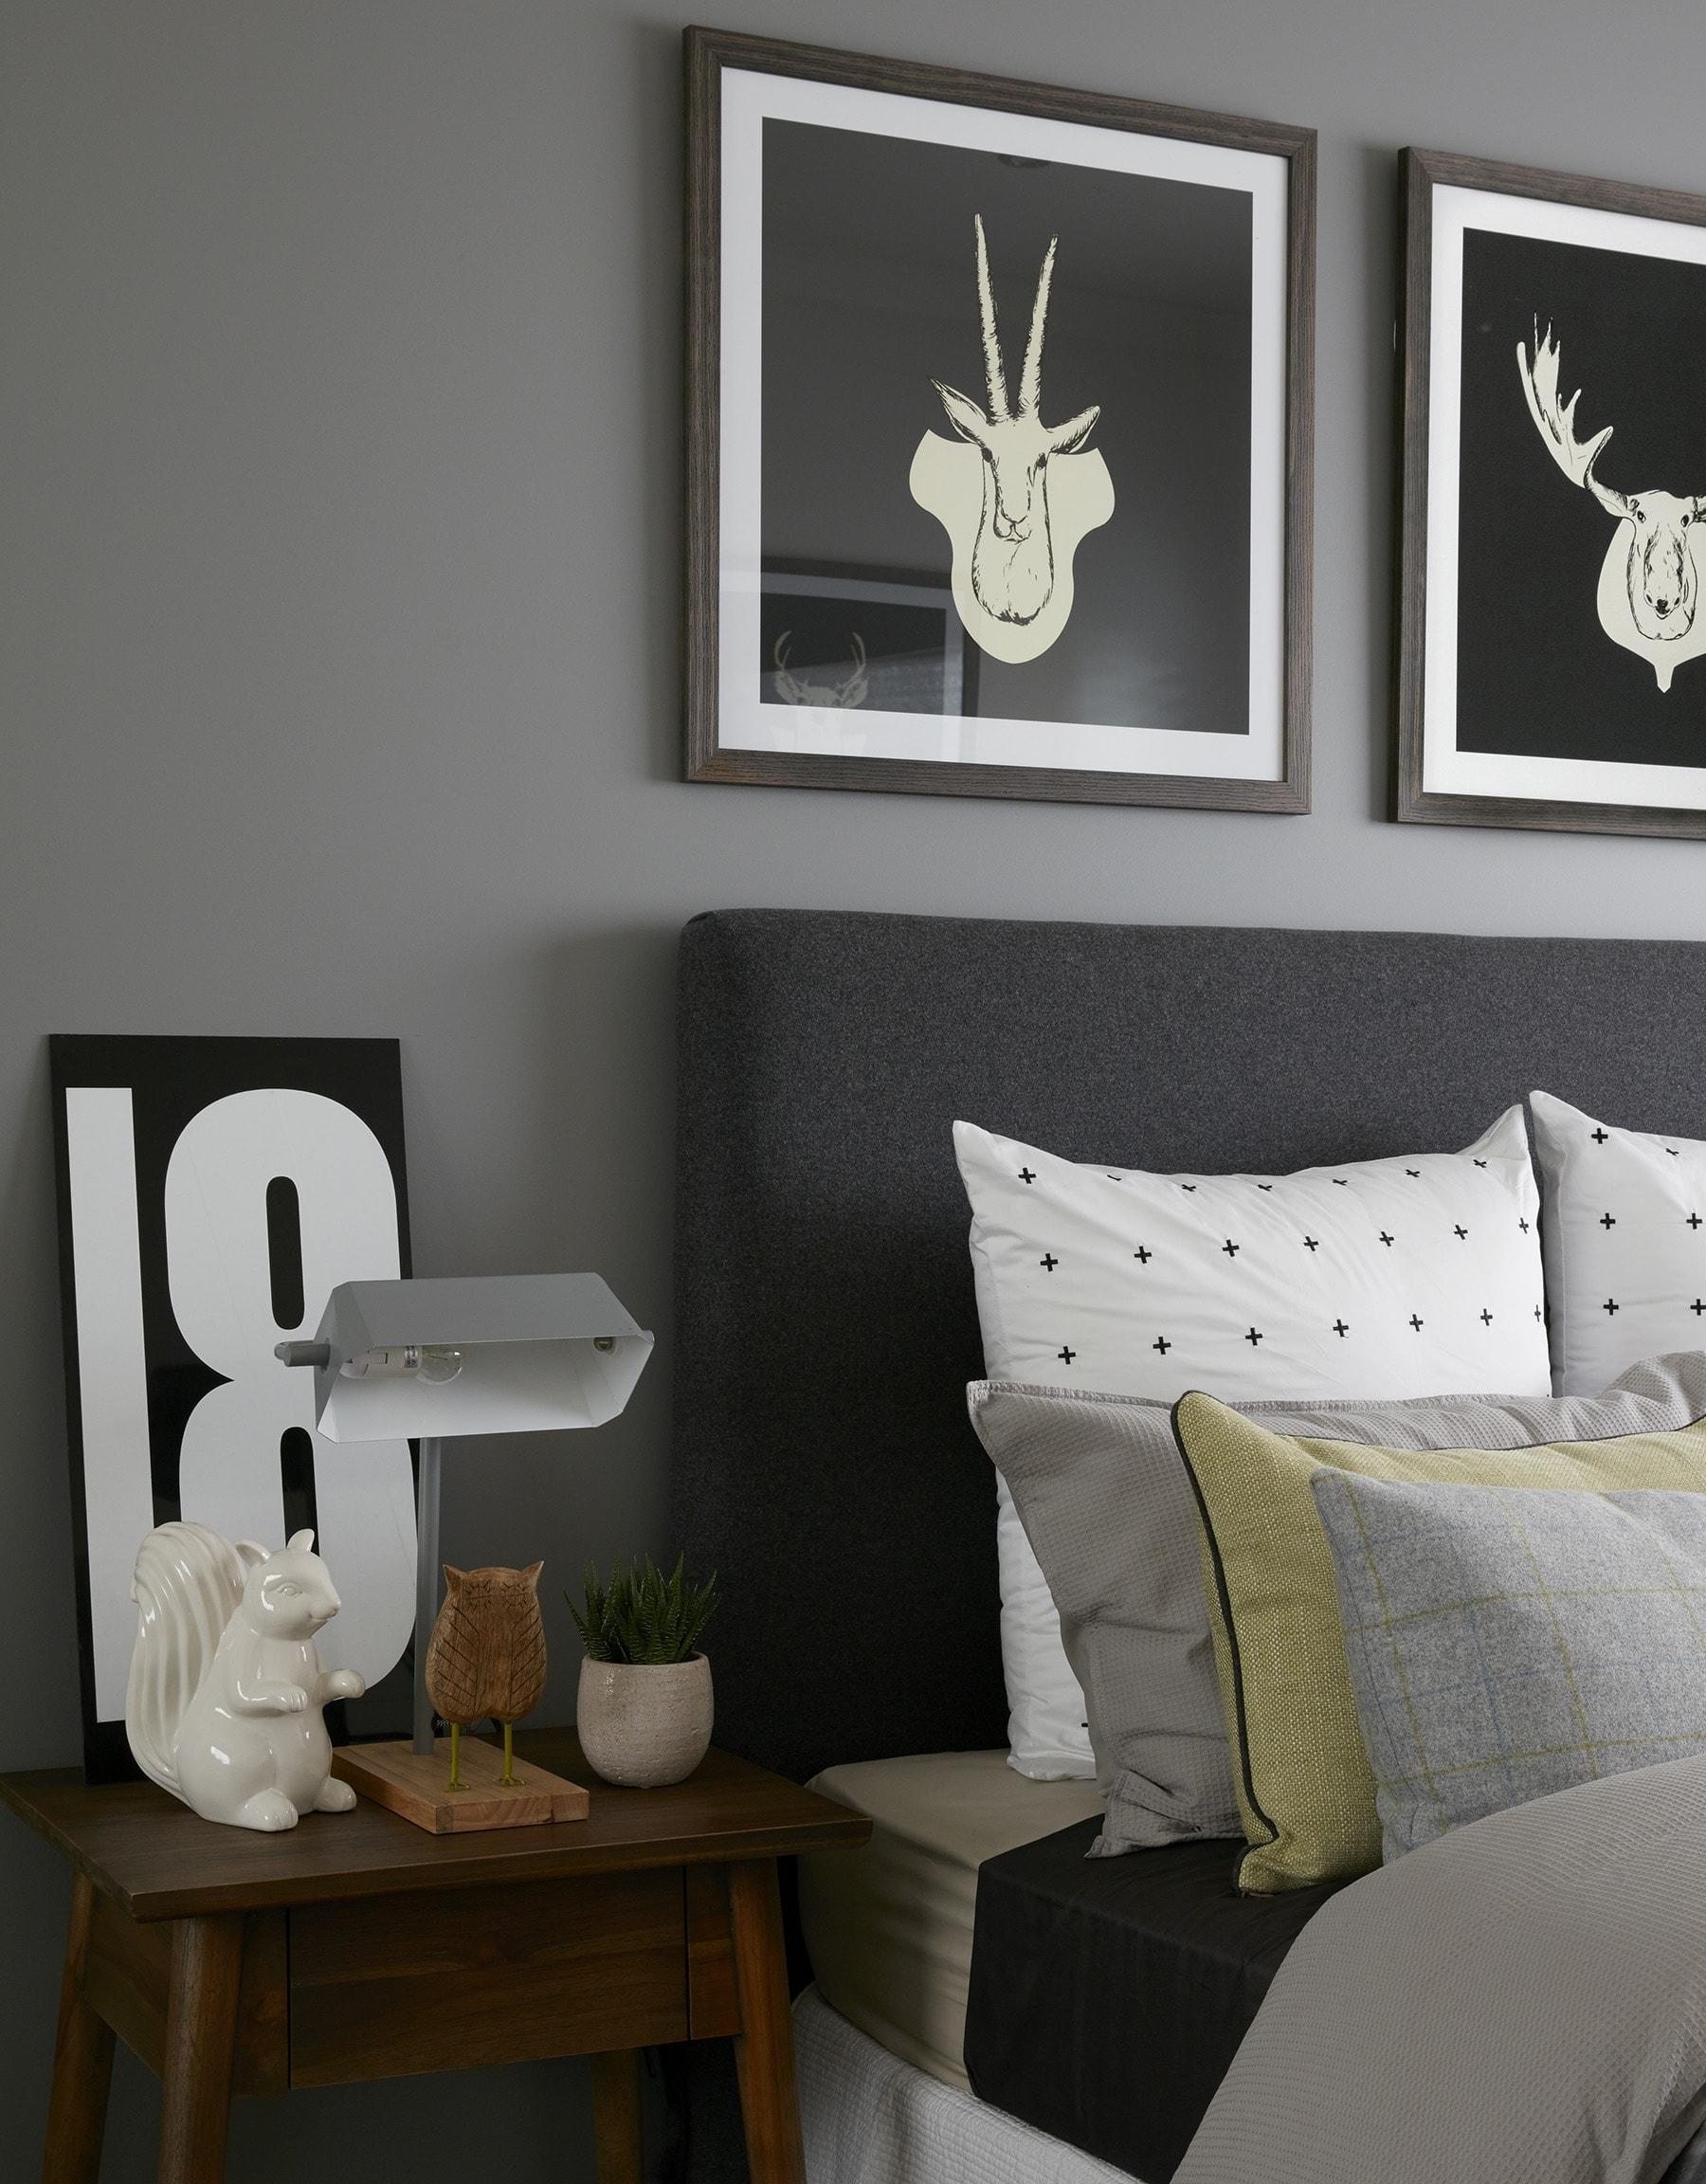 12 Dark Bedroom Wall Ideas to Embrace - TLC Interiors